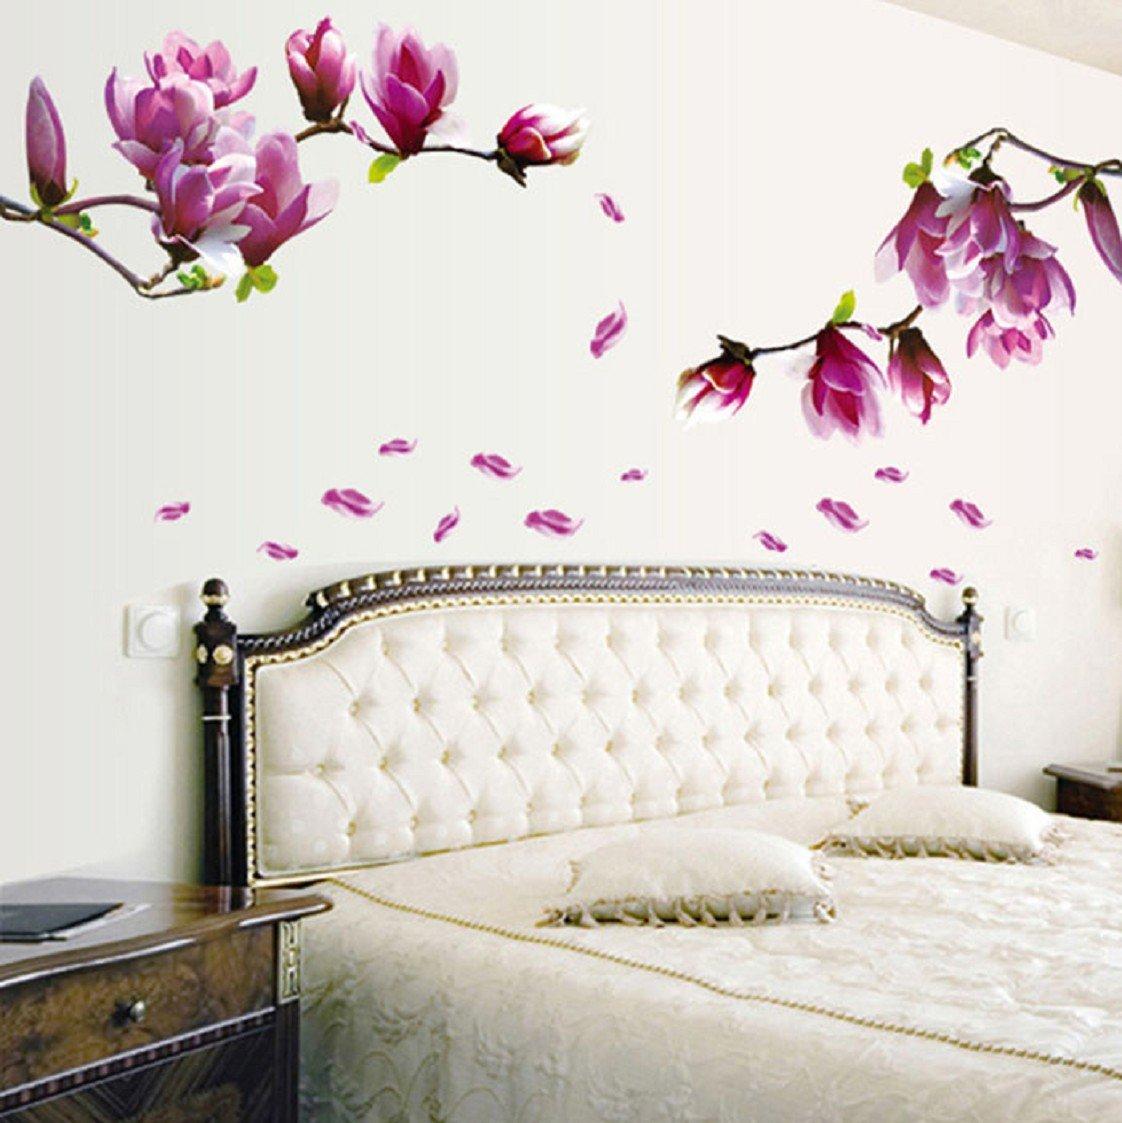 Vovotrade Autocollant Mural frais Nature Magnolia Fleur Decal amovible mur PVC Sticker Home Decor